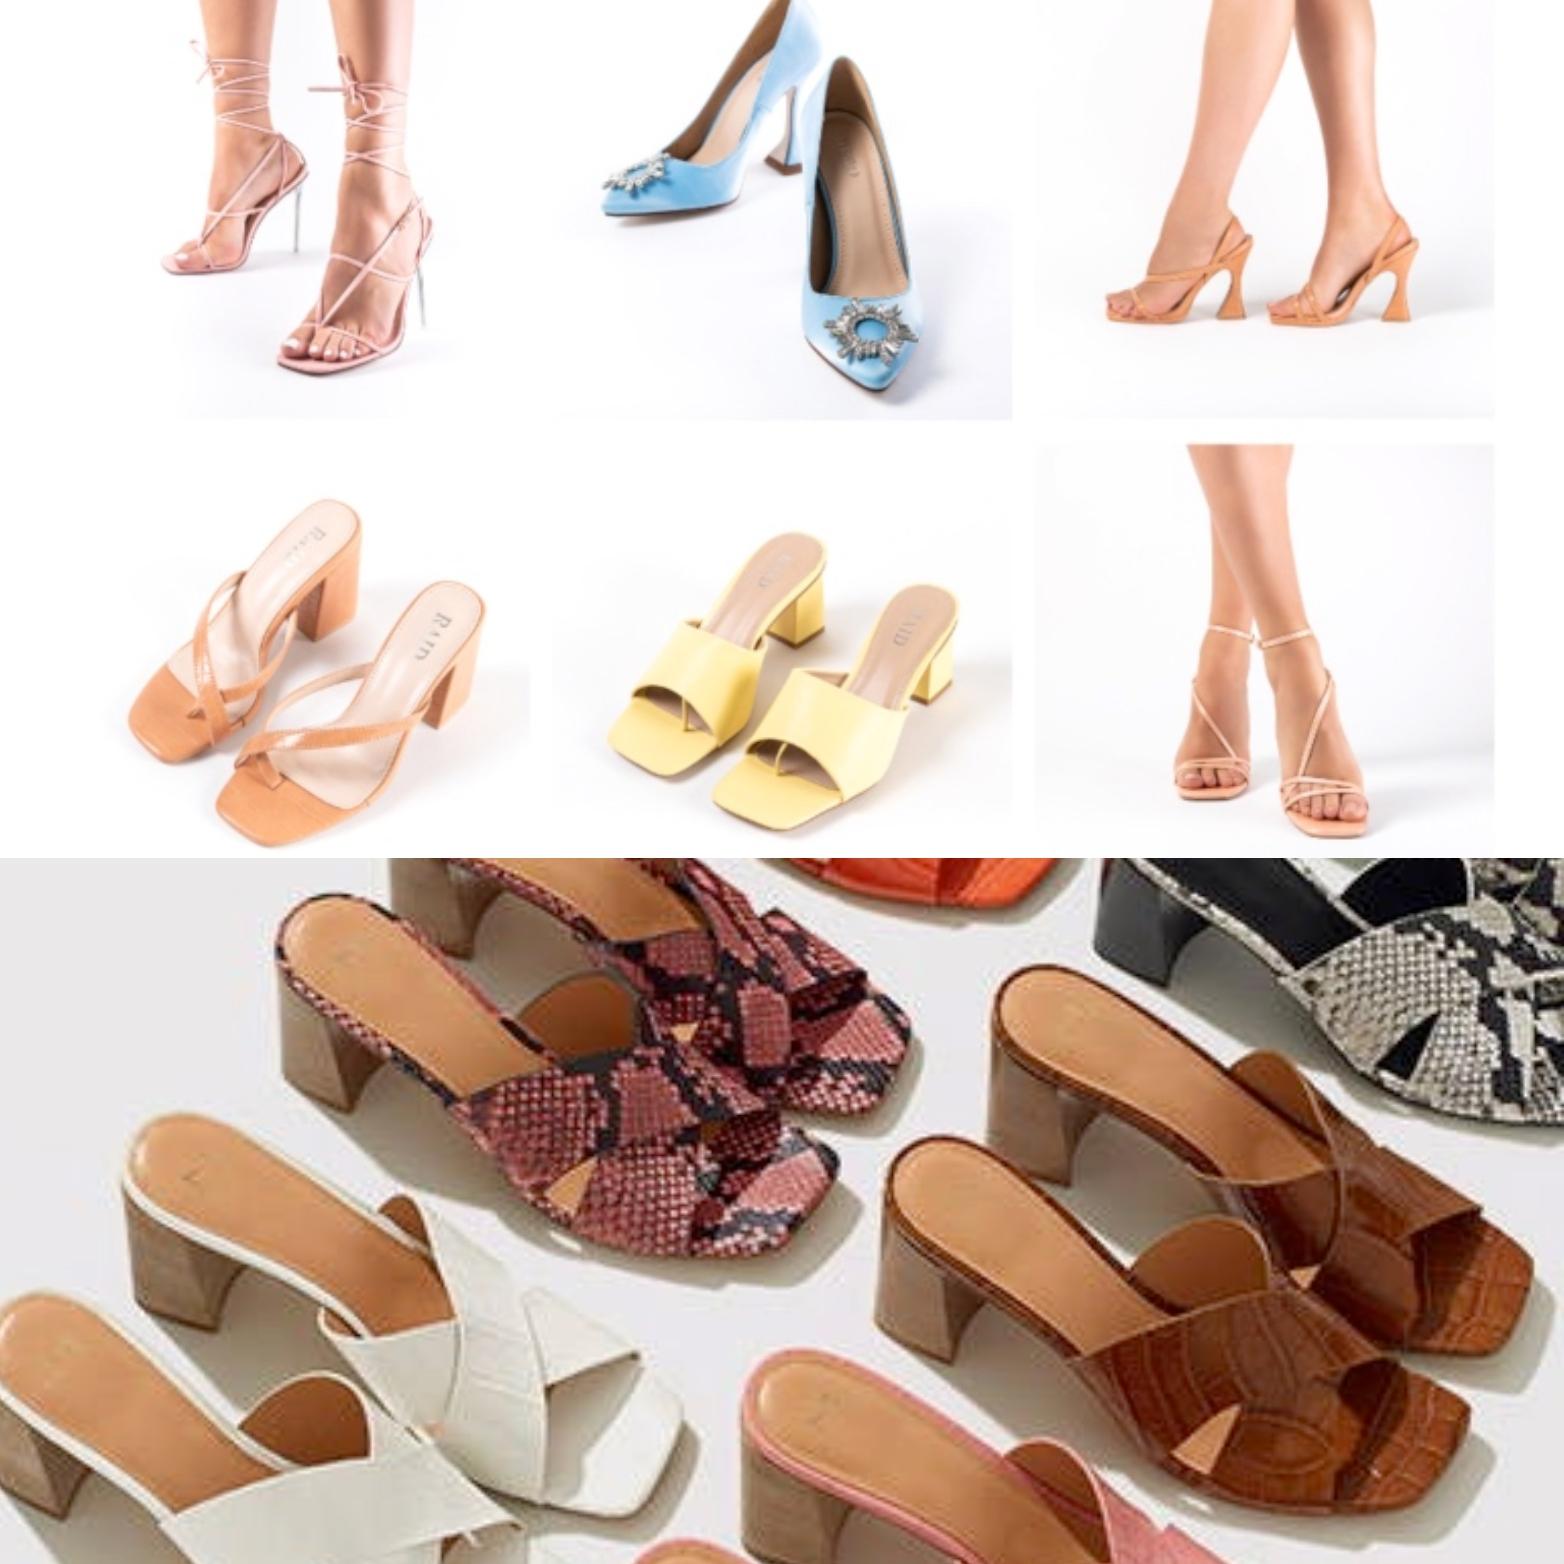 negozi online scarpe donna